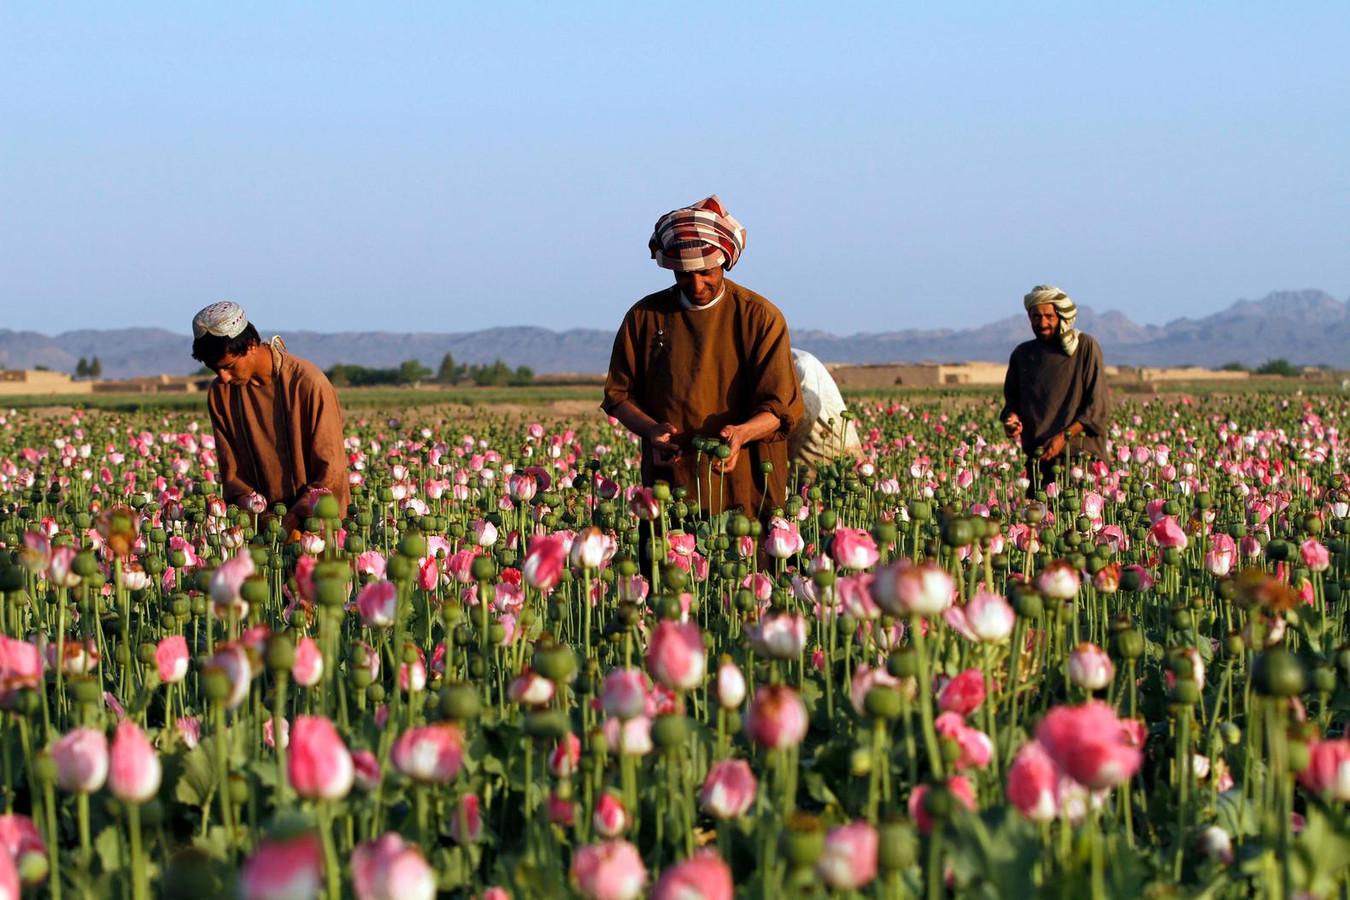 Heroïnestaat nr. 1 onder dwang van de taliban | Foto | AD.nl